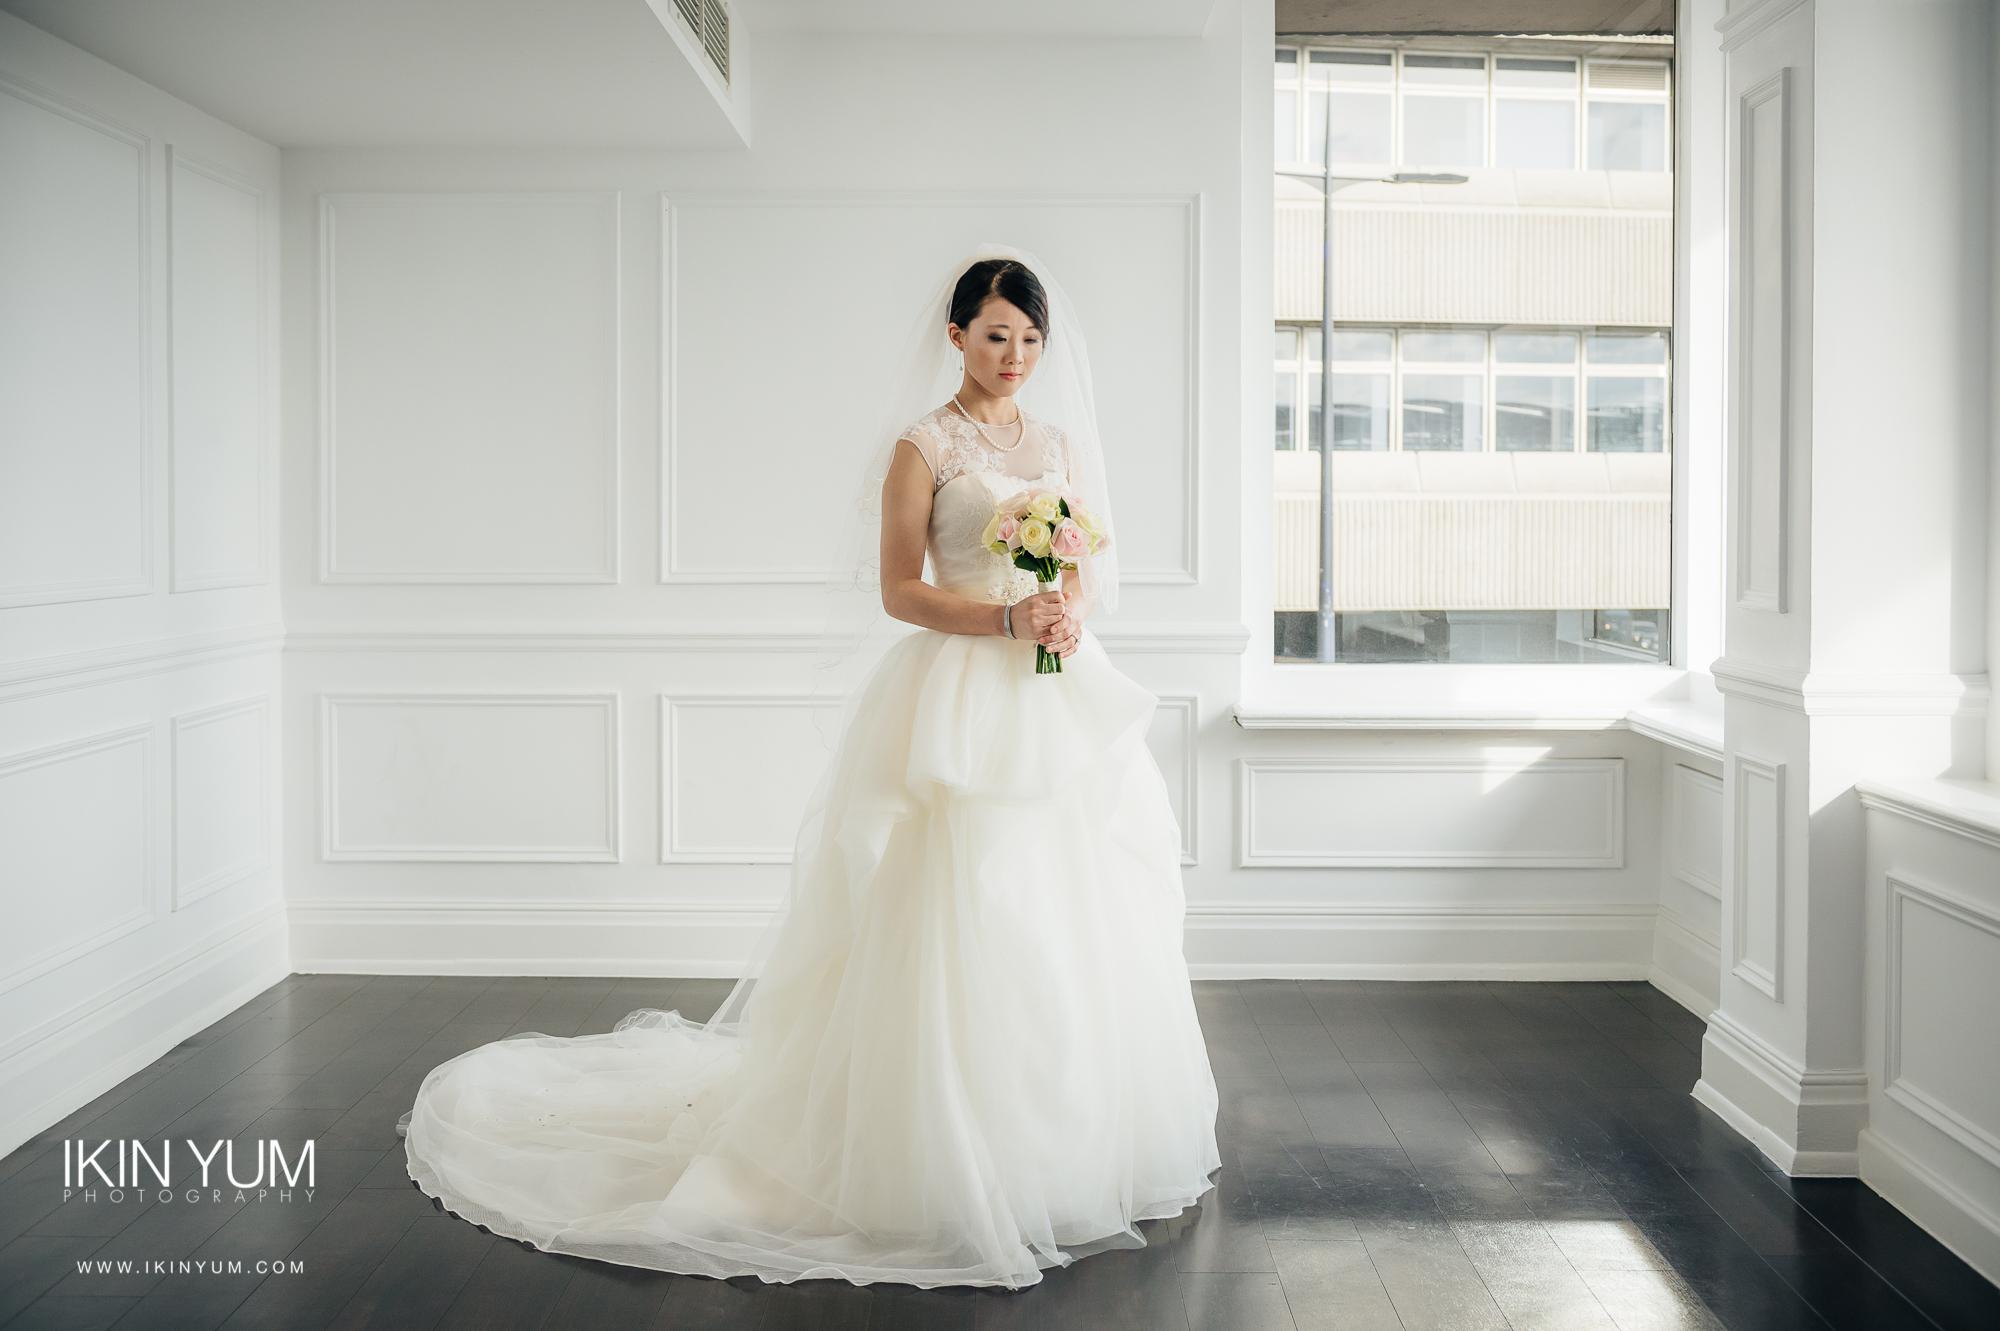 Mermaid river rooms Wedding - Ikin Yum Photography-043.jpg